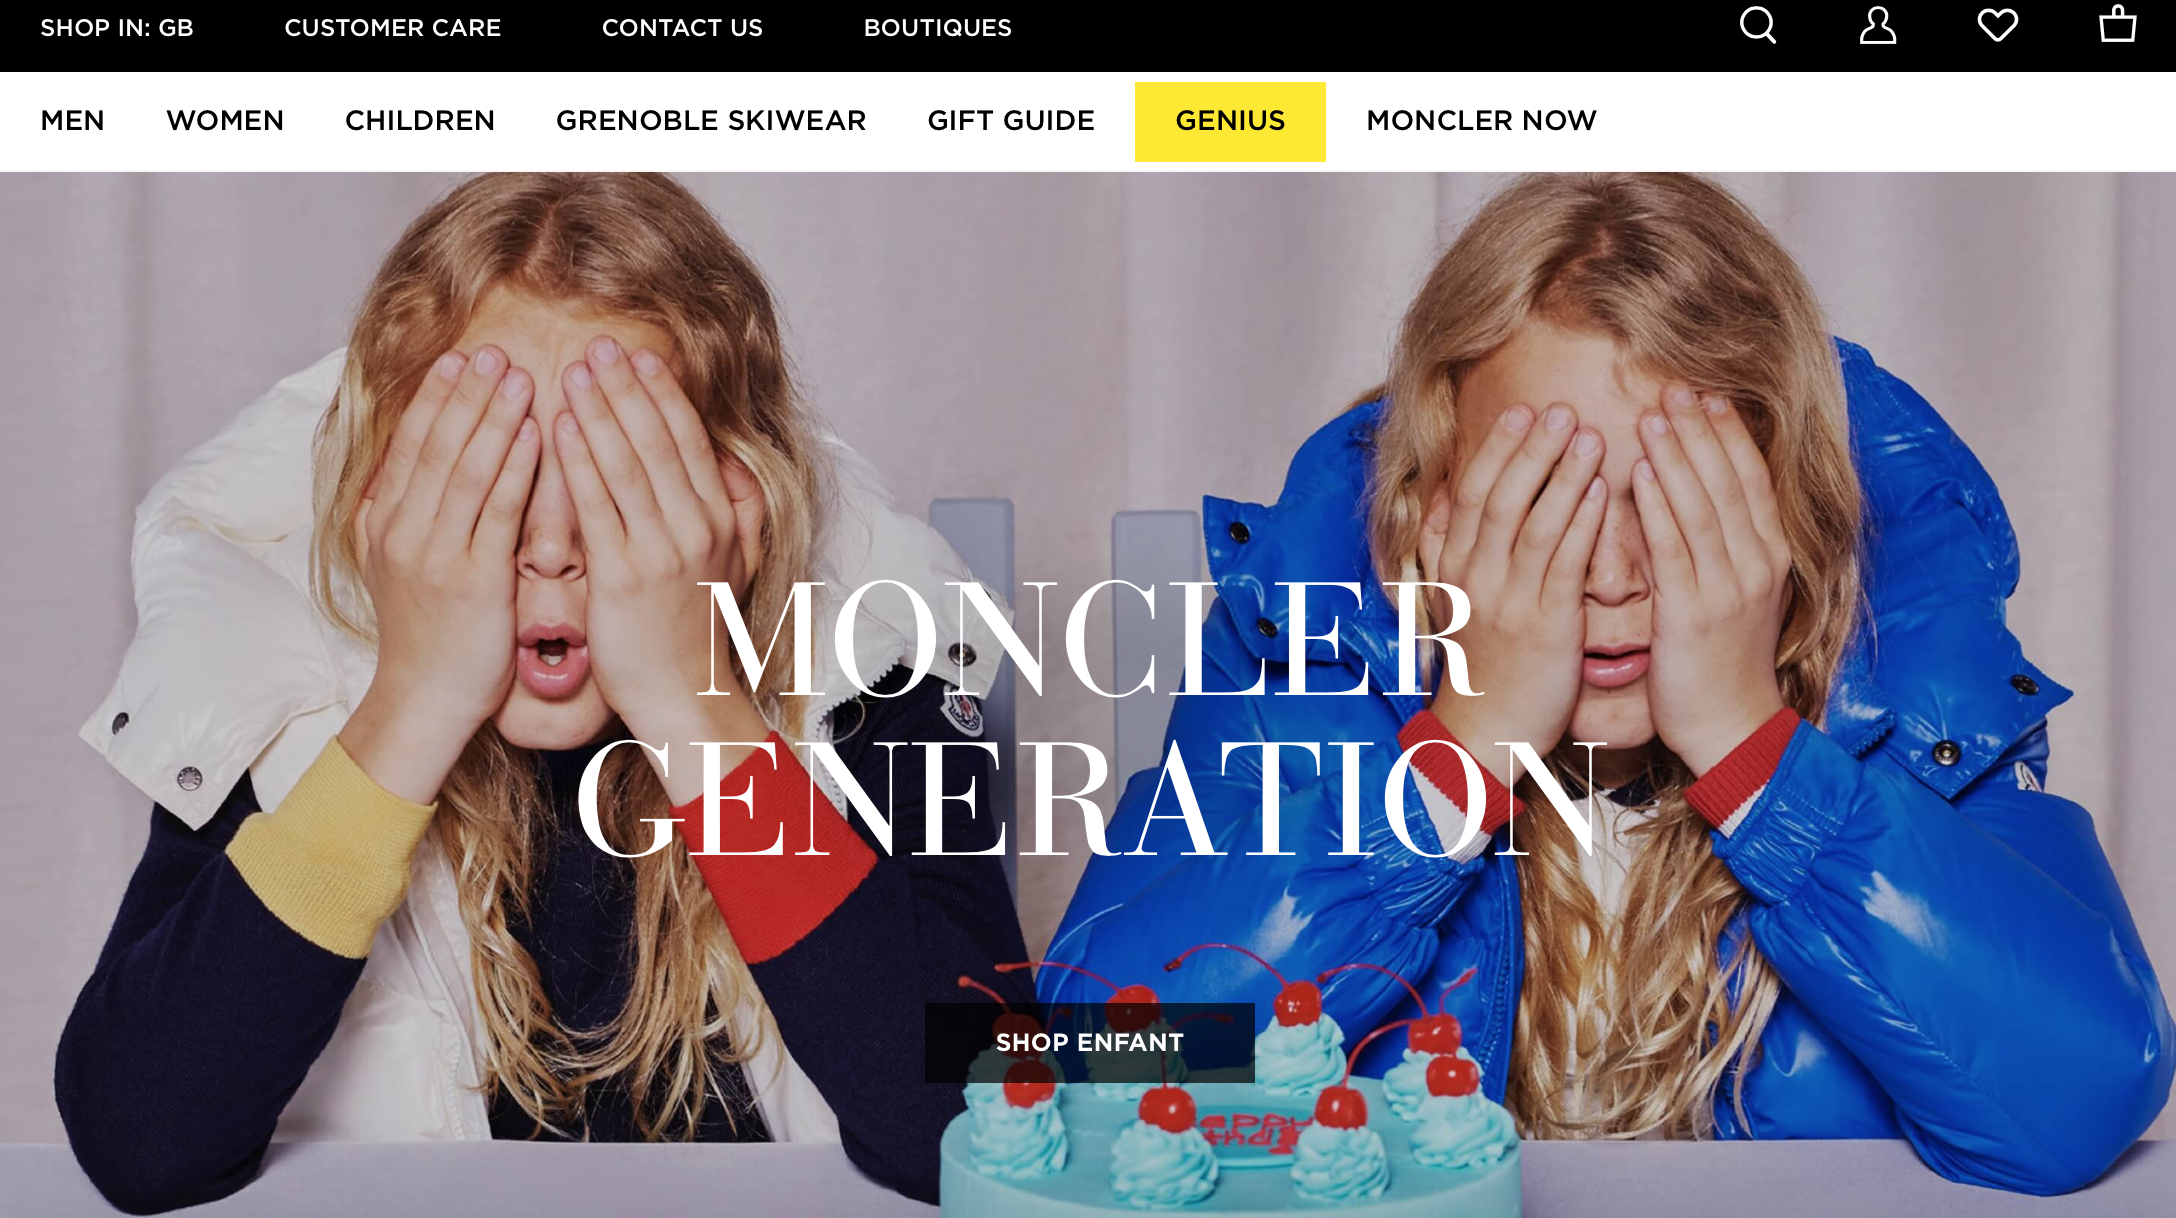 Moncler CEO 回应收购传闻